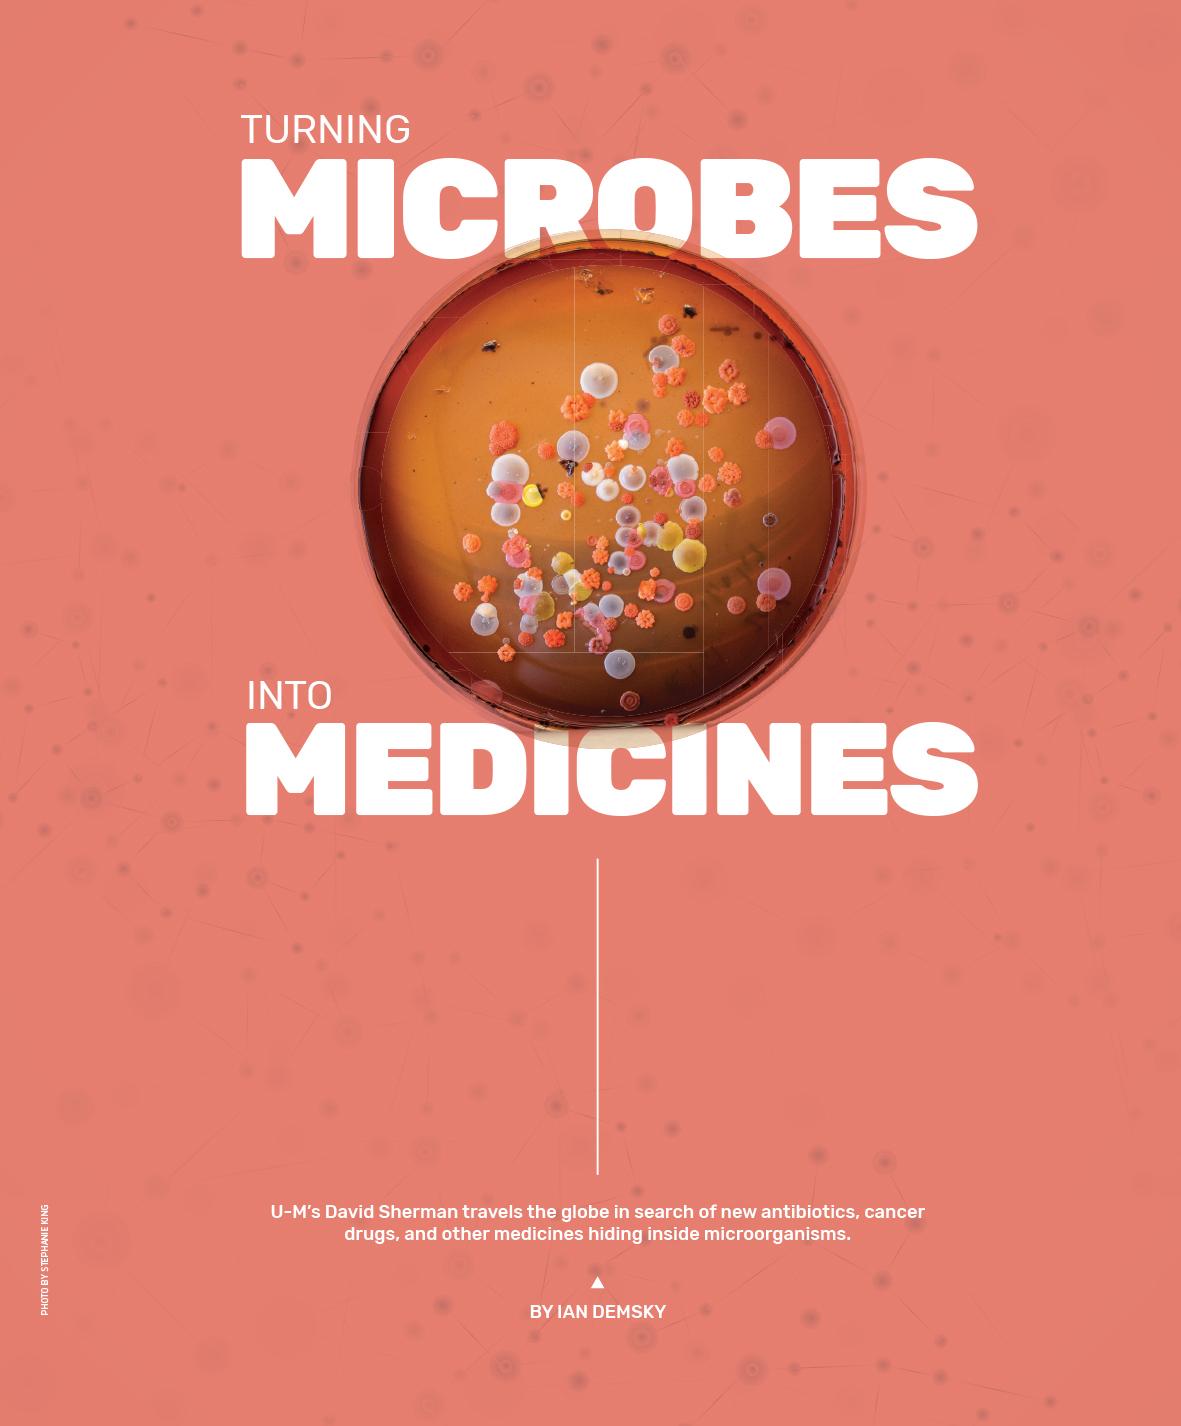 alumnus_casestudy_singles_microbes